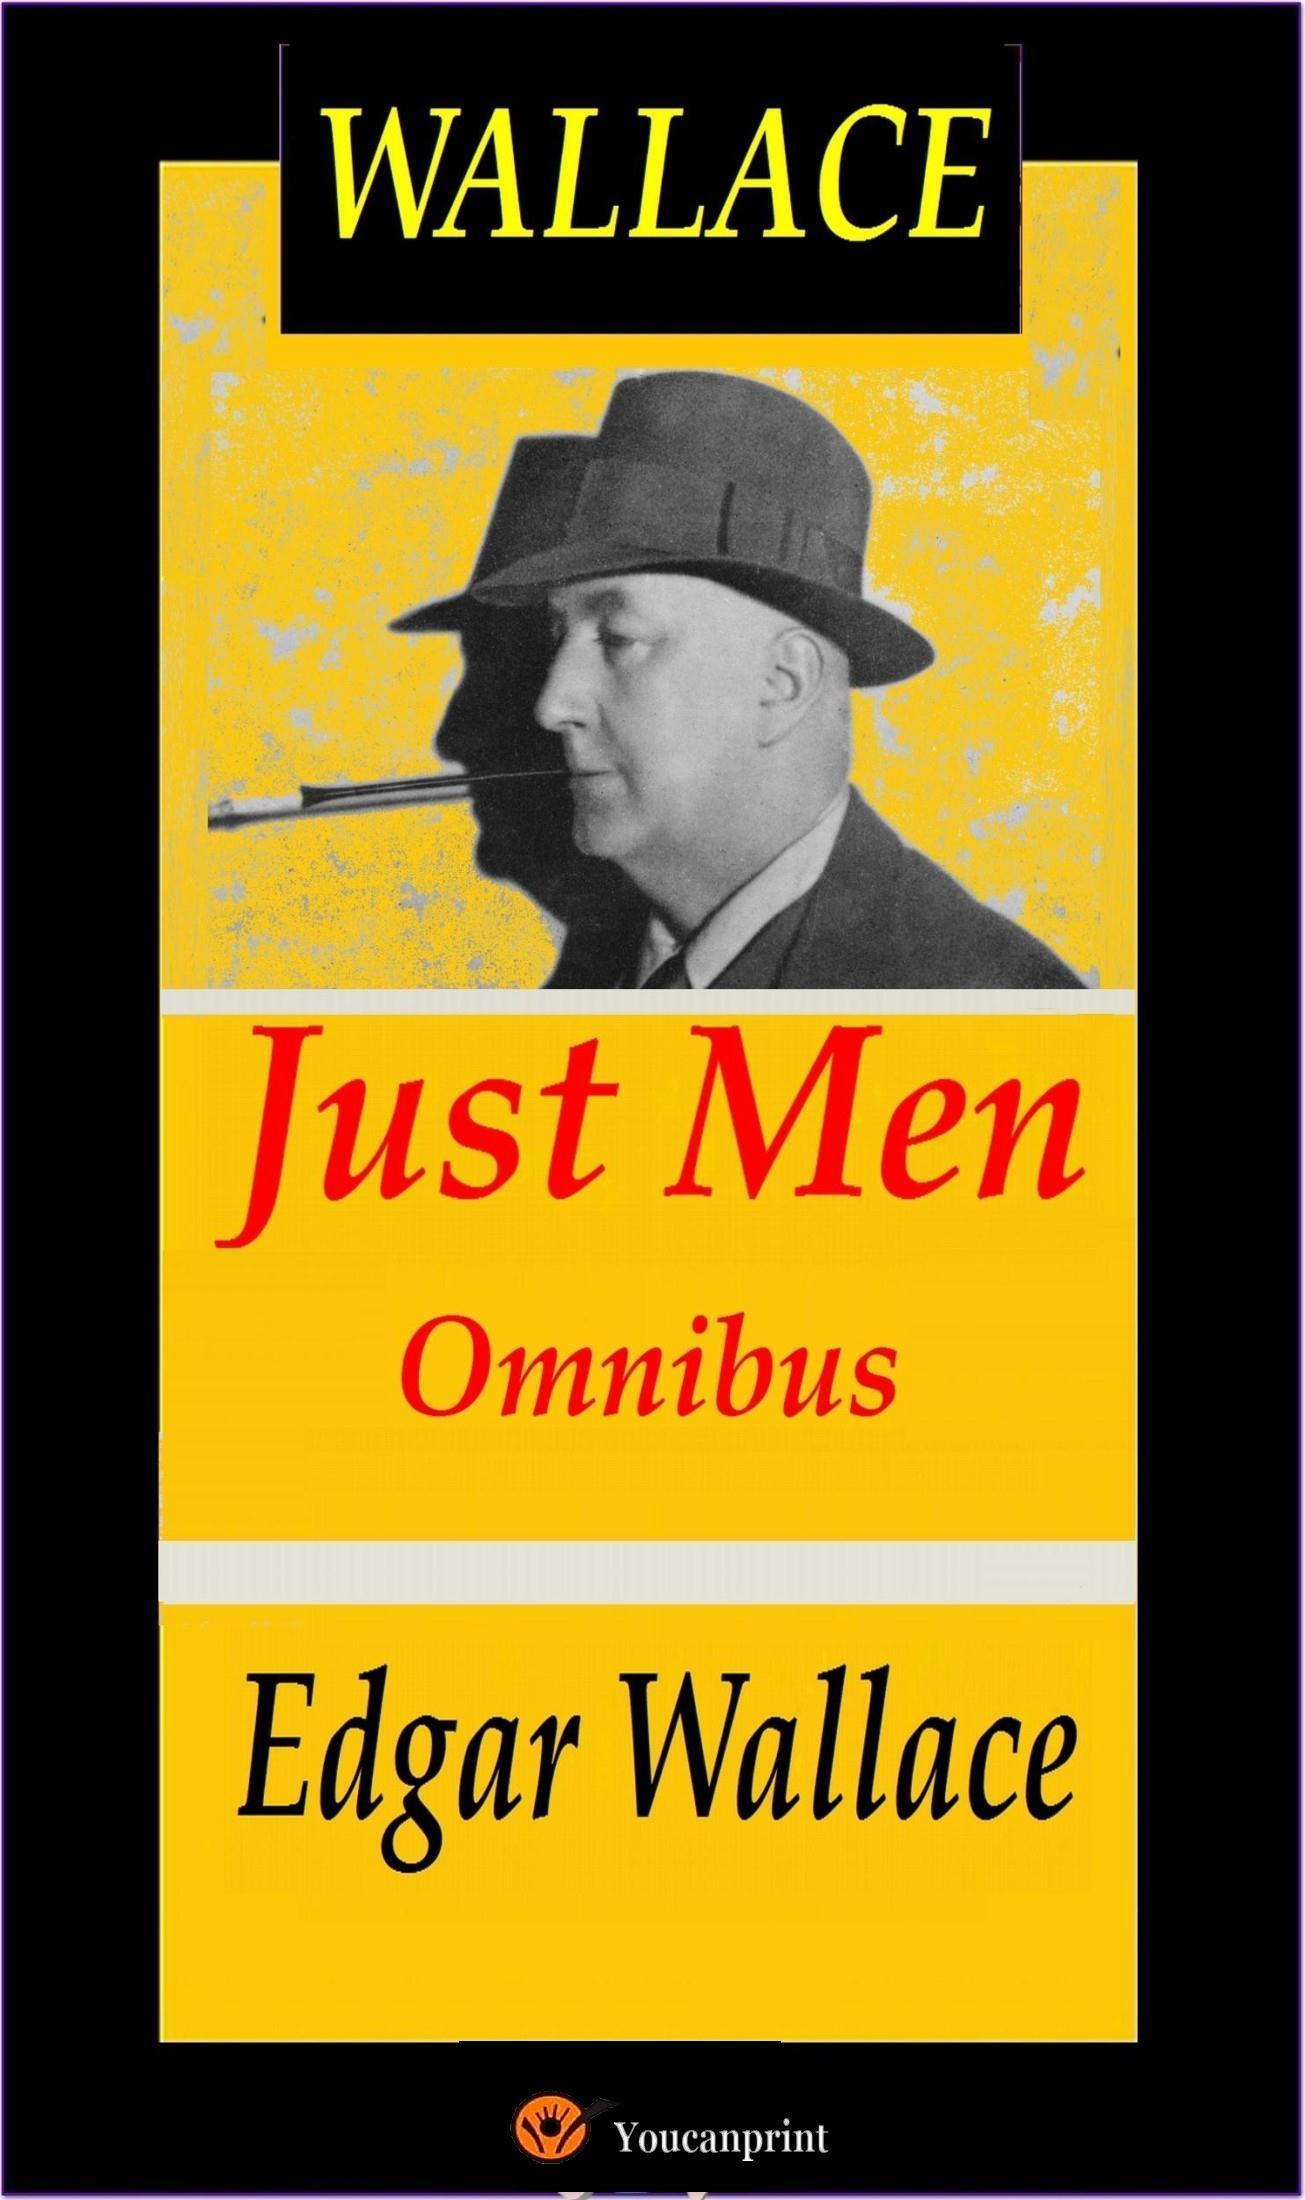 Just Men Omnibus (Complete collection)